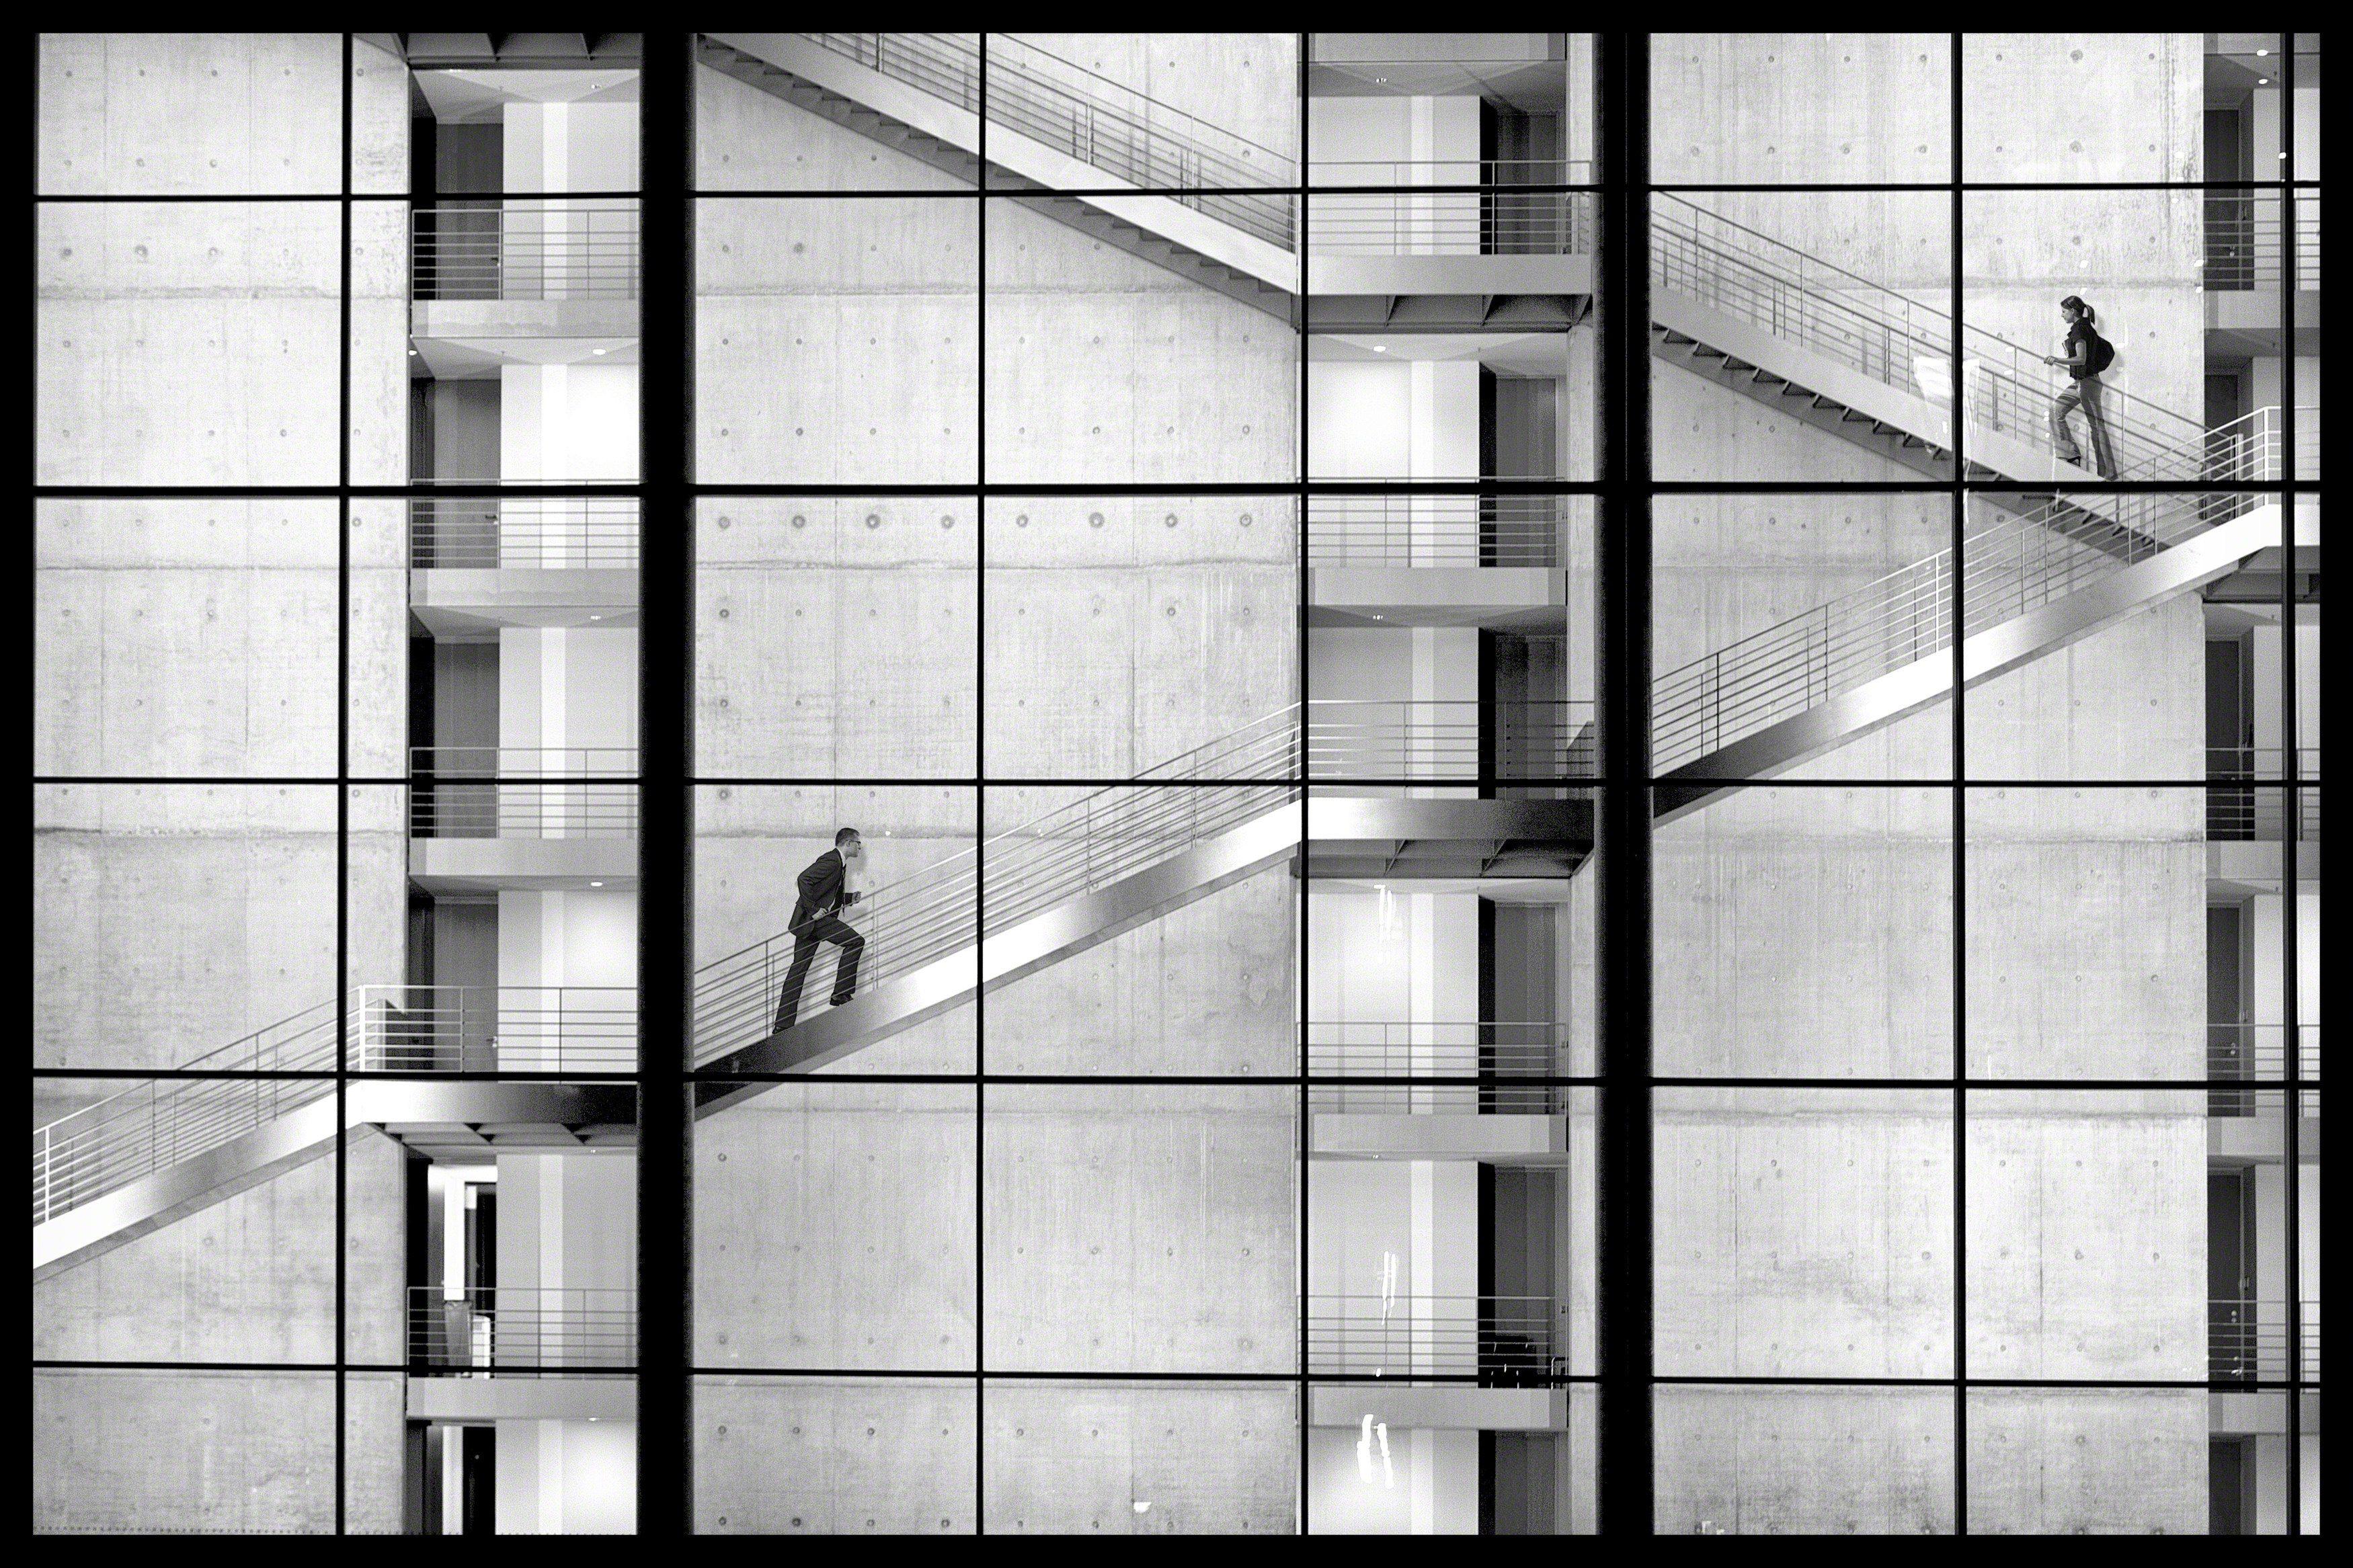 © Walter Schonenbrocher, Germany, Open entry, Architecture, 2013 Sony World Photography Awards / Fotoğraf